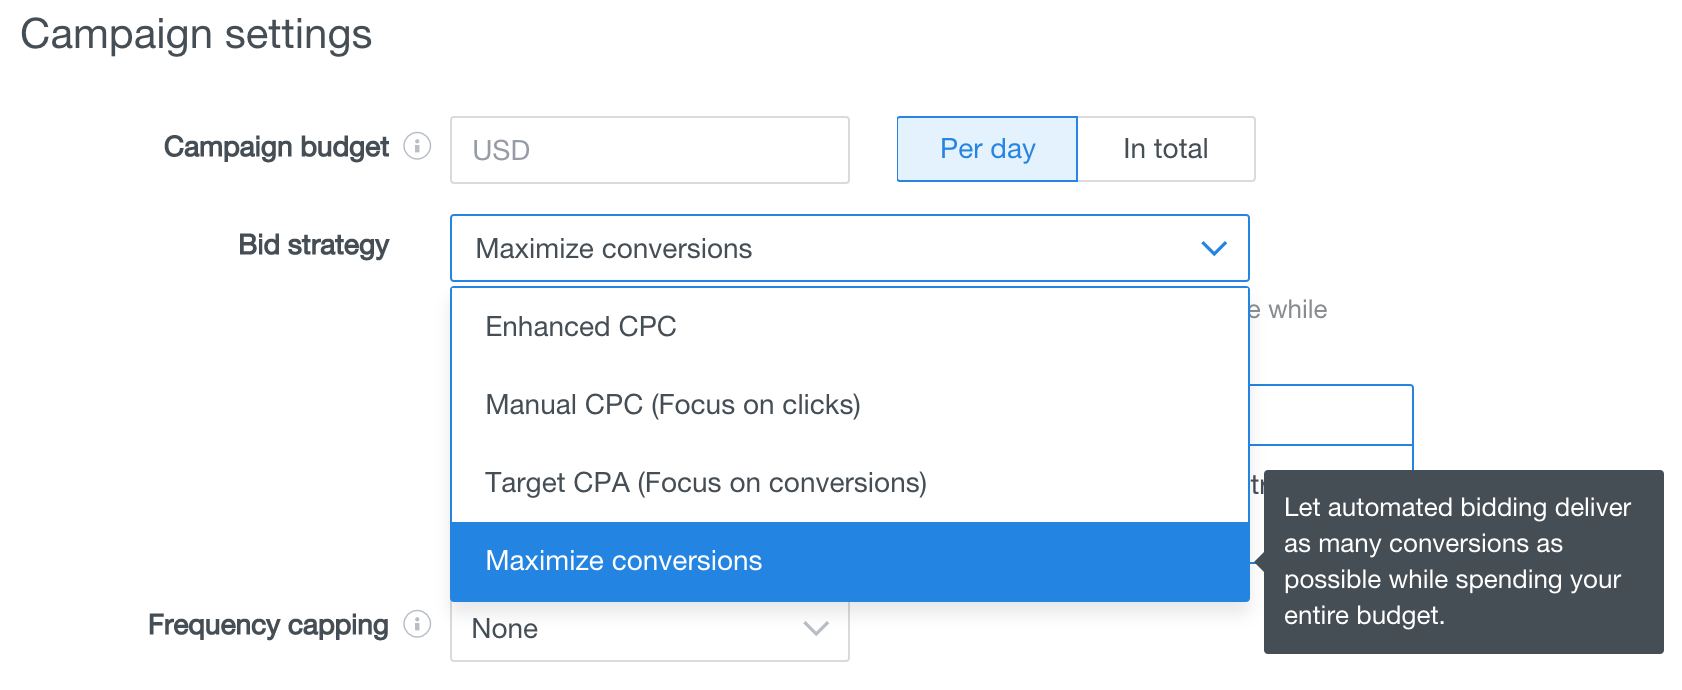 bid strategy max conversions